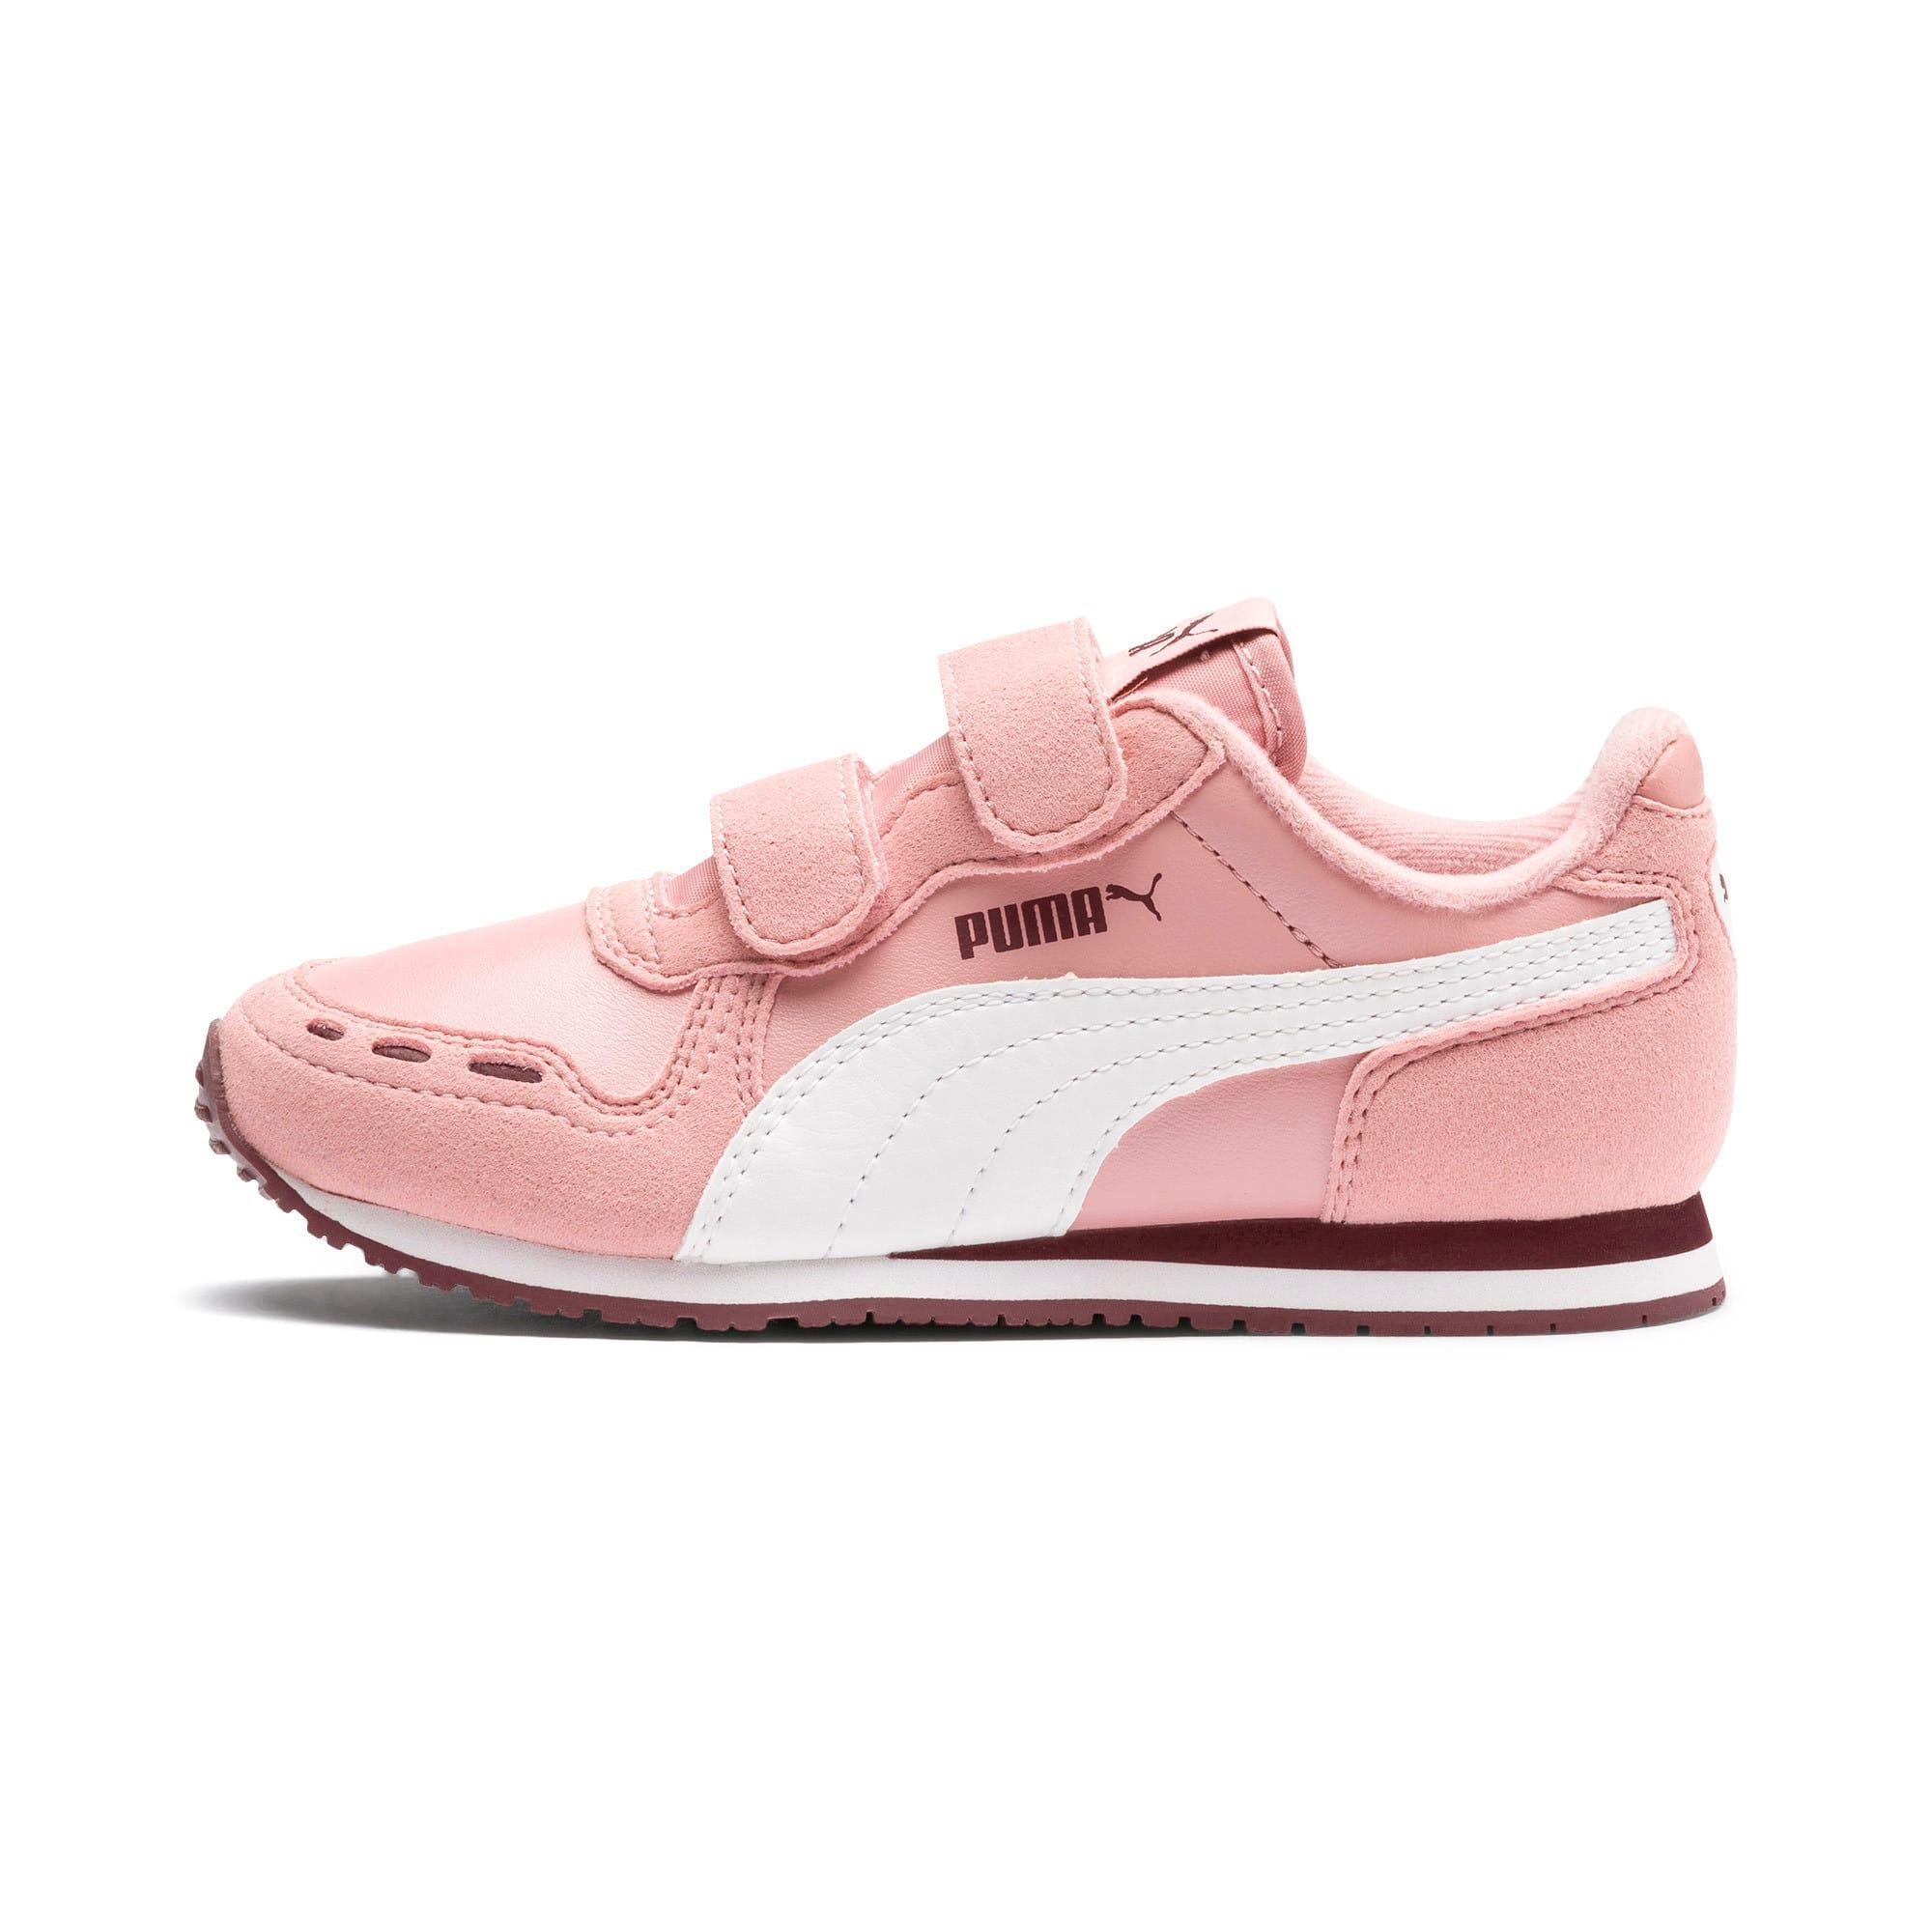 Thumbnail 1 of Cabana Racer SL V PS Baby Sneaker, Bridal Rose-Puma White, medium